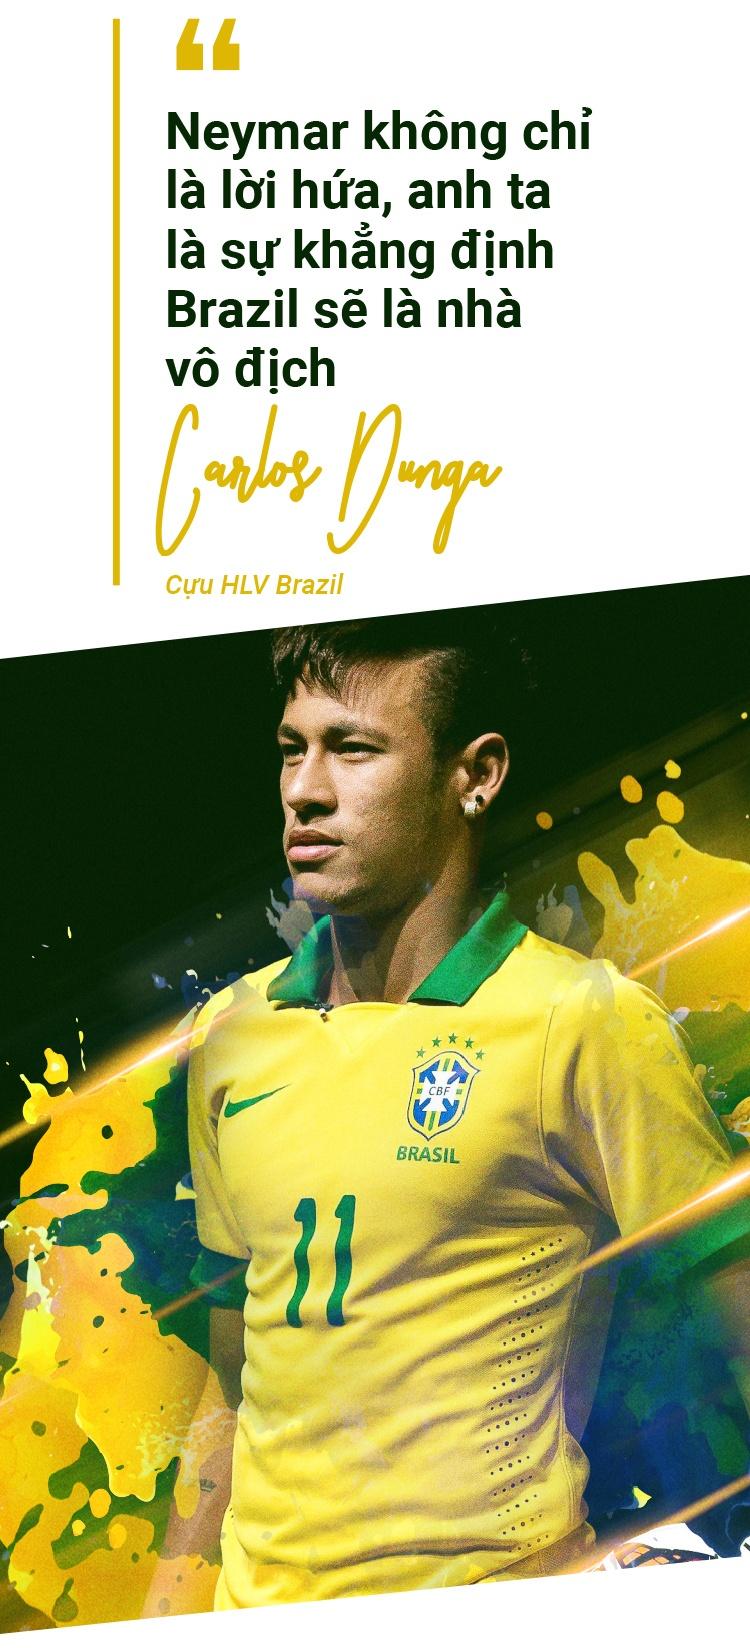 Neymar, sau nuoc mat la vinh quang hinh anh 10